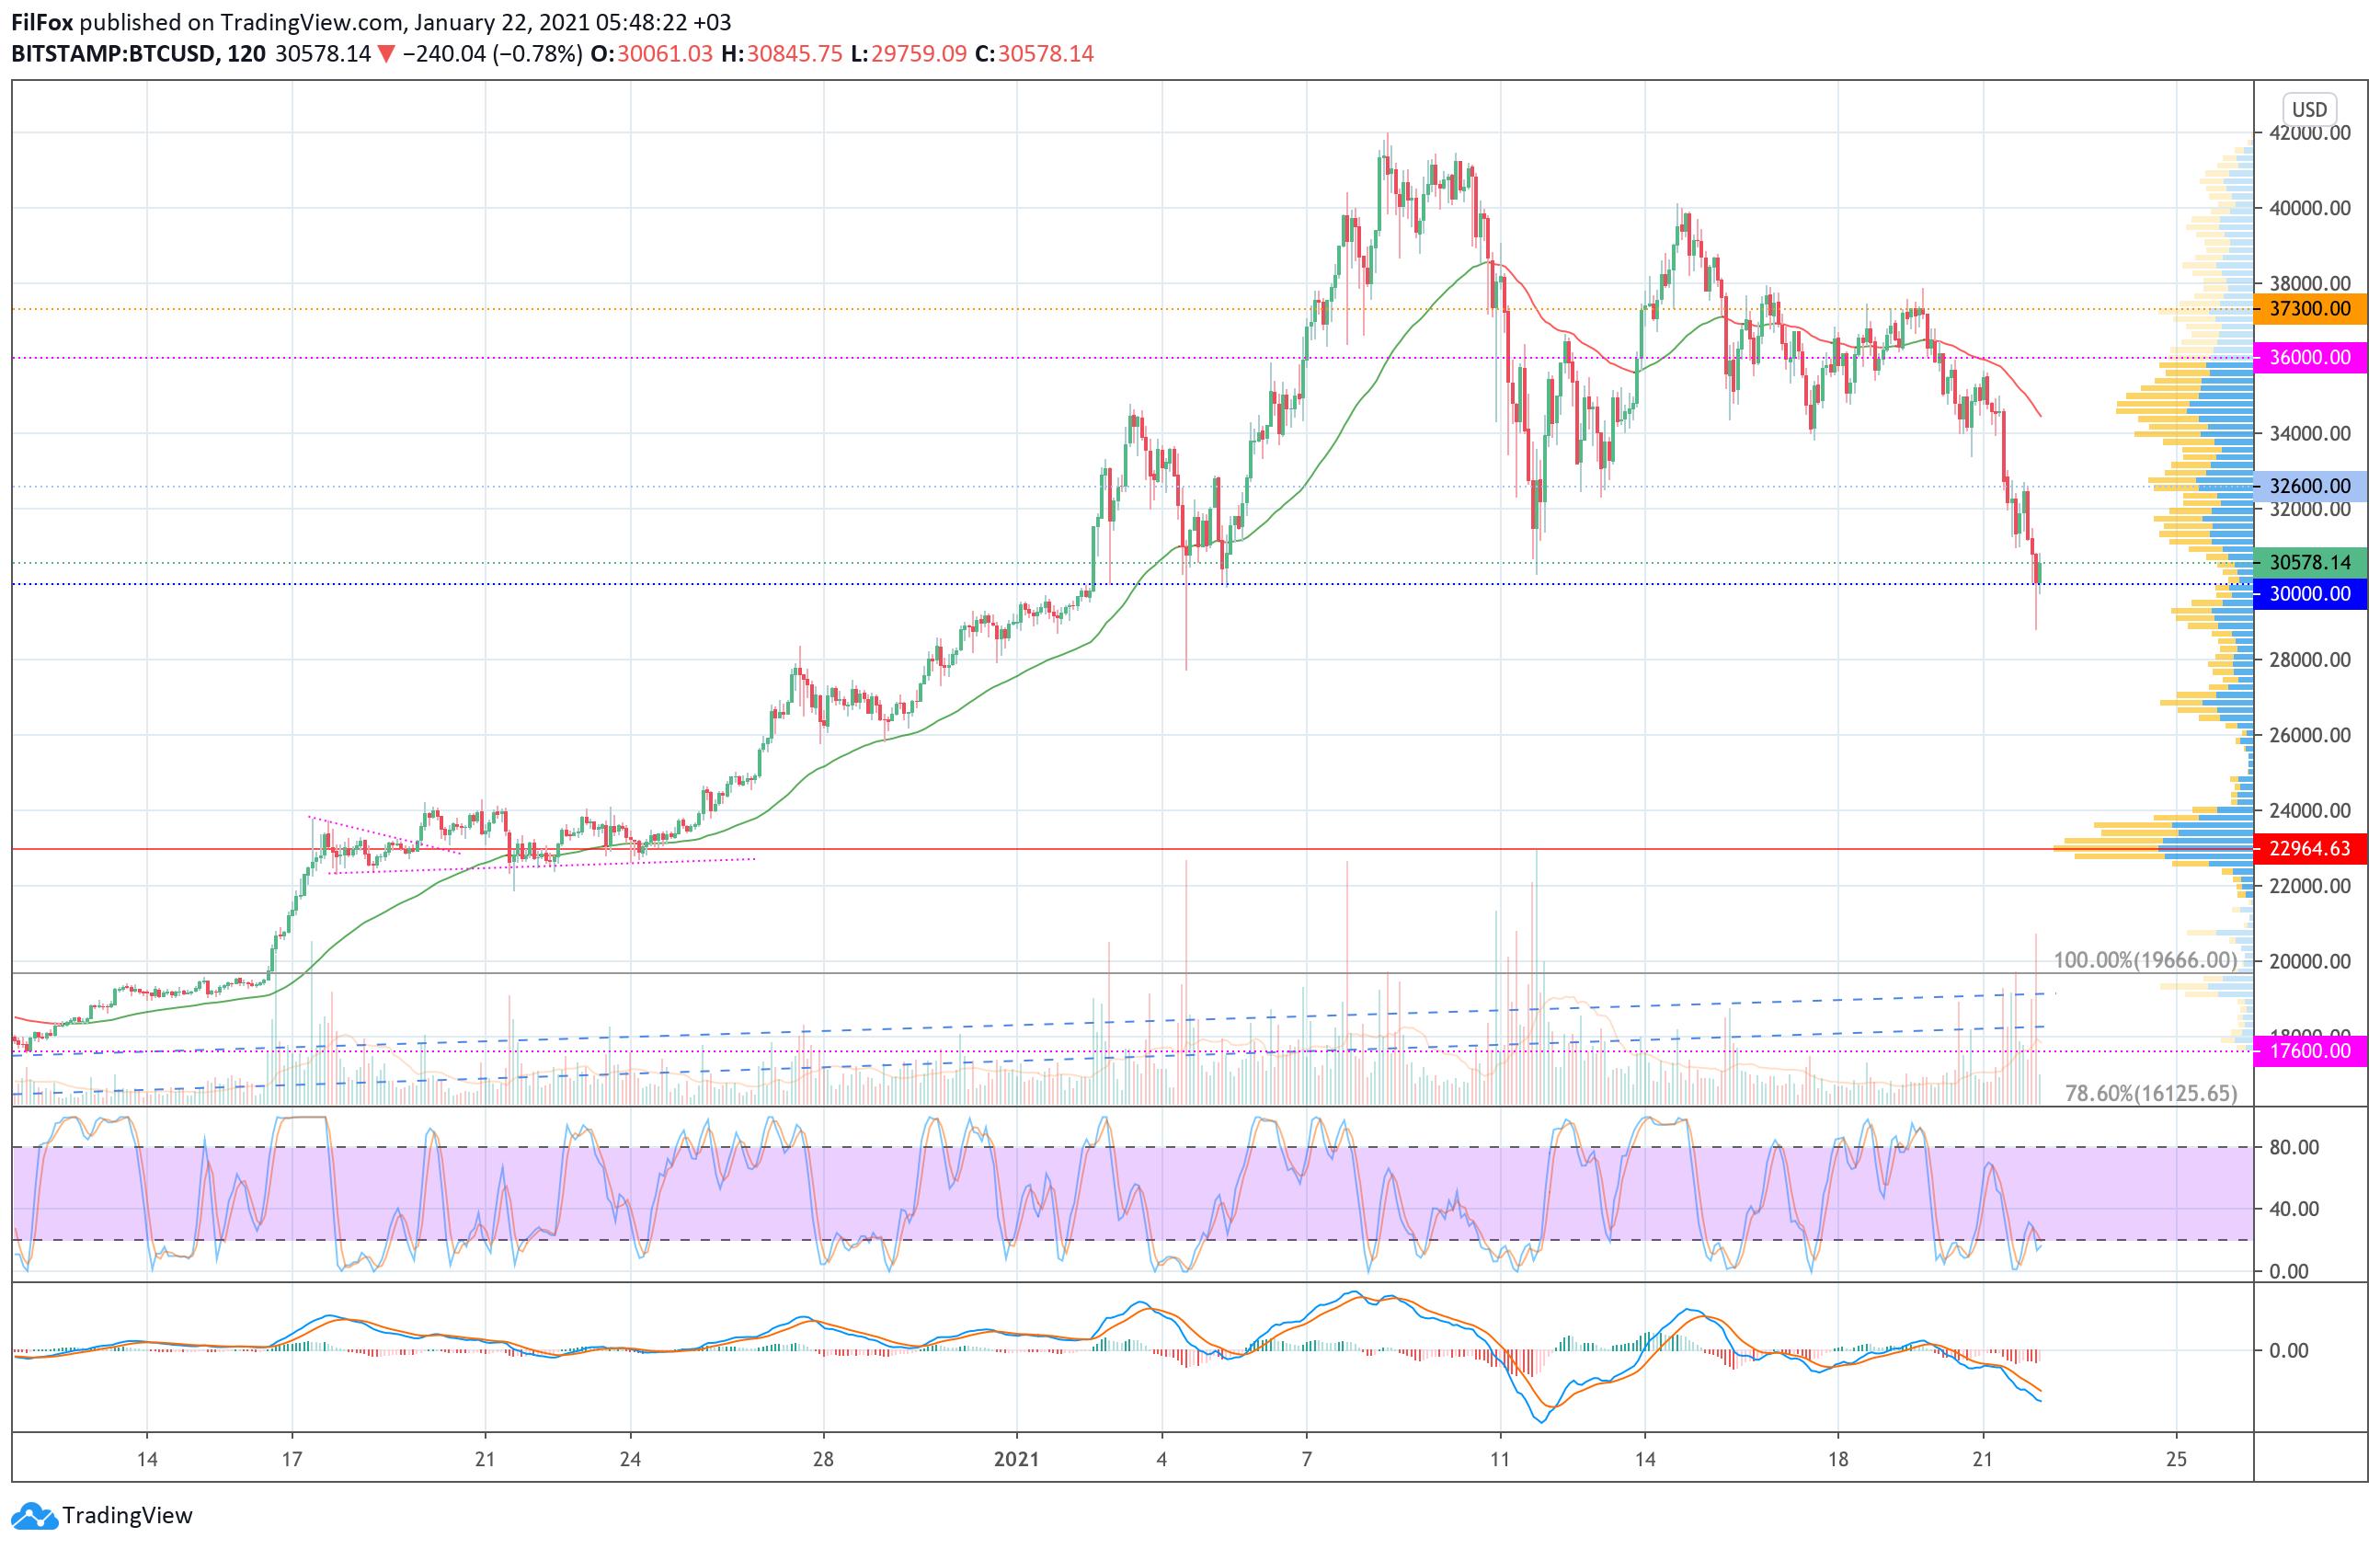 Анализ цен Bitcoin, Ethereum, Ripple на 22.01.2021